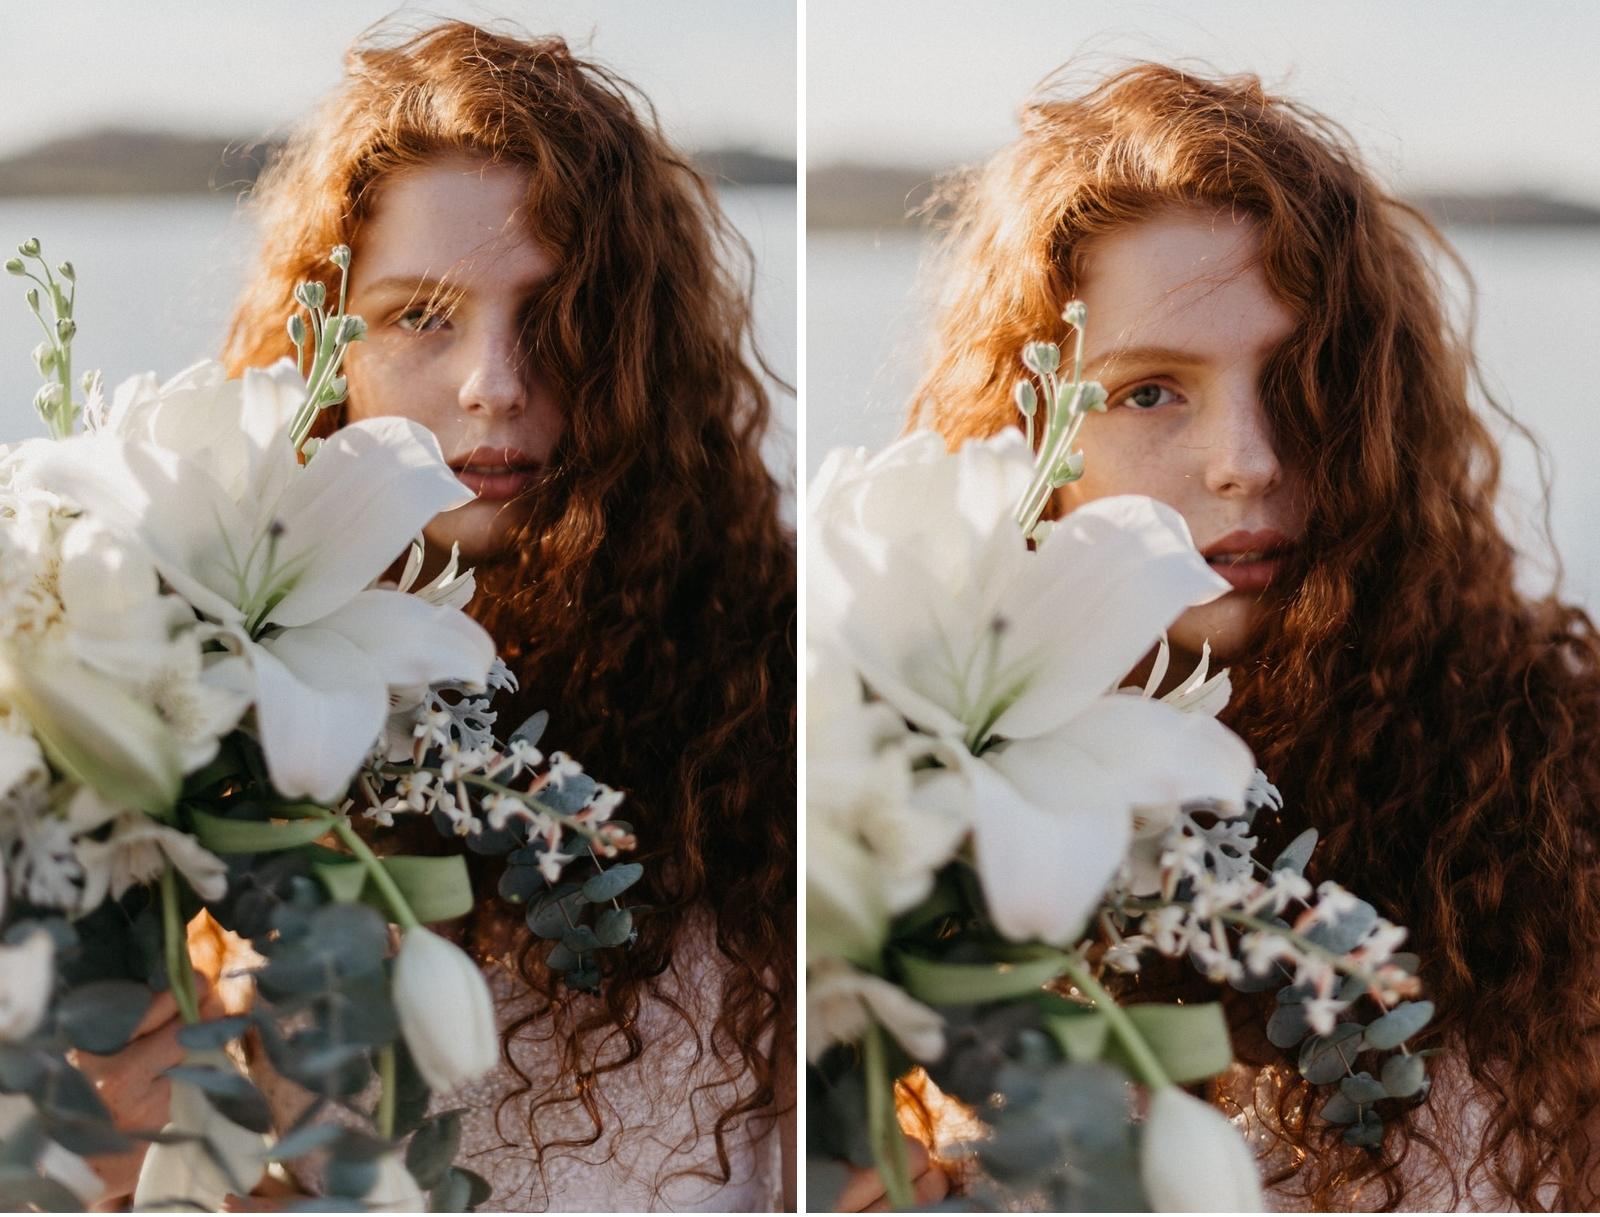 Céu_fotografia_casamentos_goiás_brasil_folk_noivas_brides_alternativo (103)23.jpg